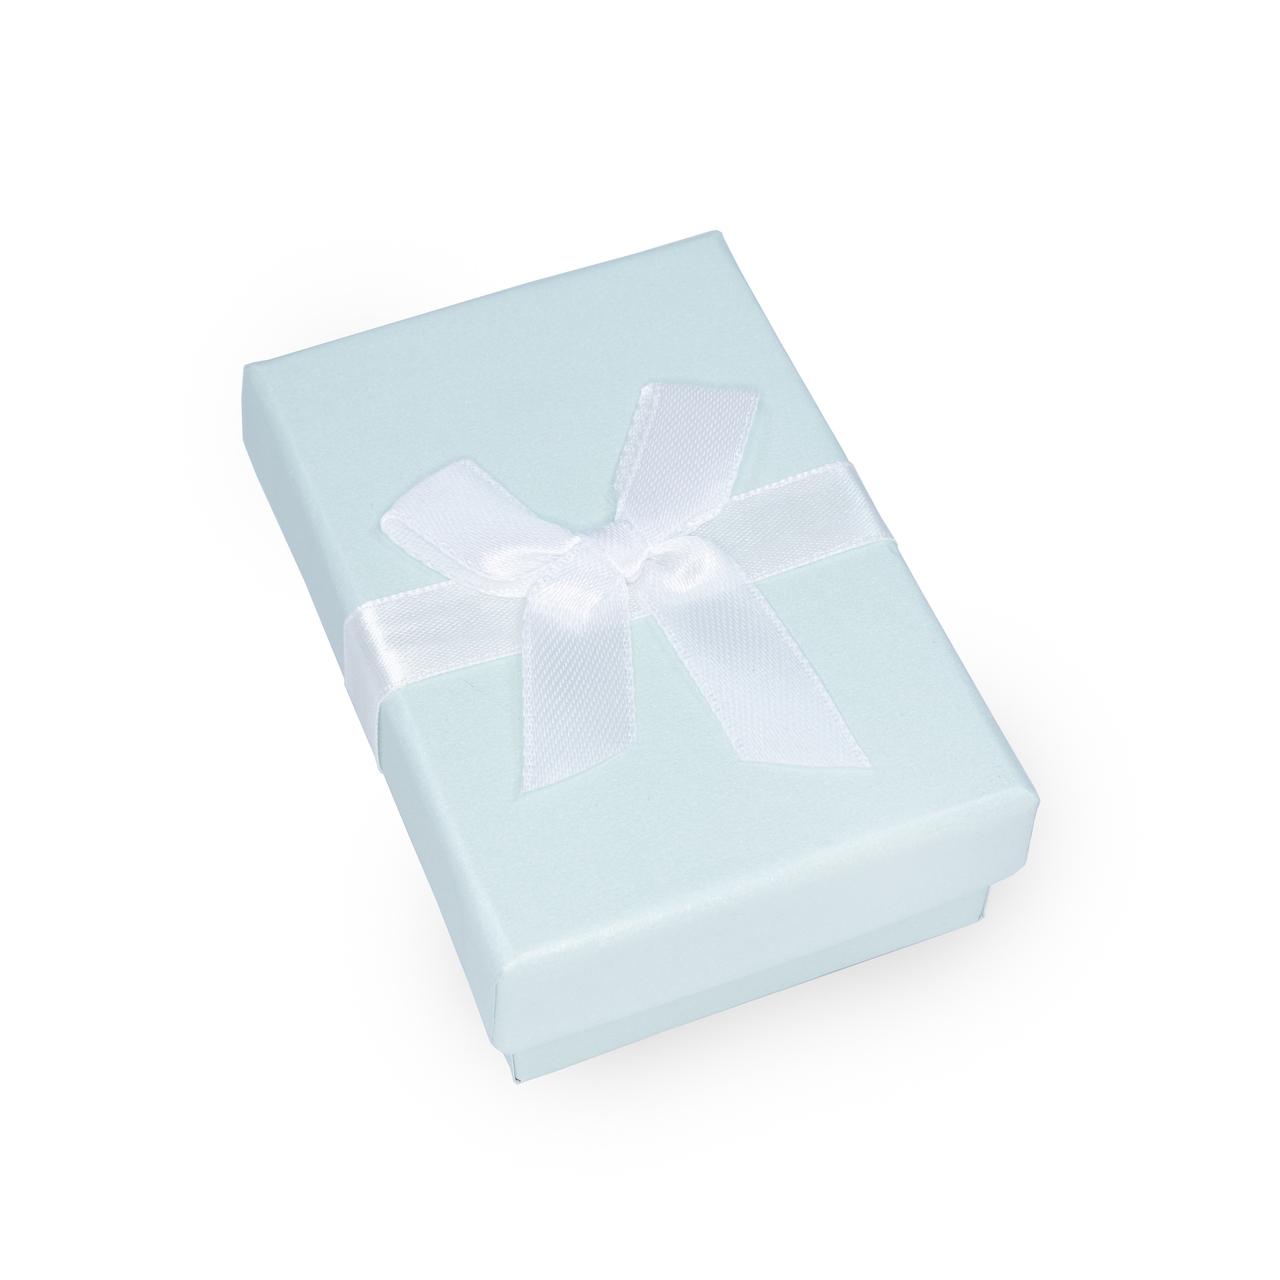 Caixa de Presente Retangular Verde Claro